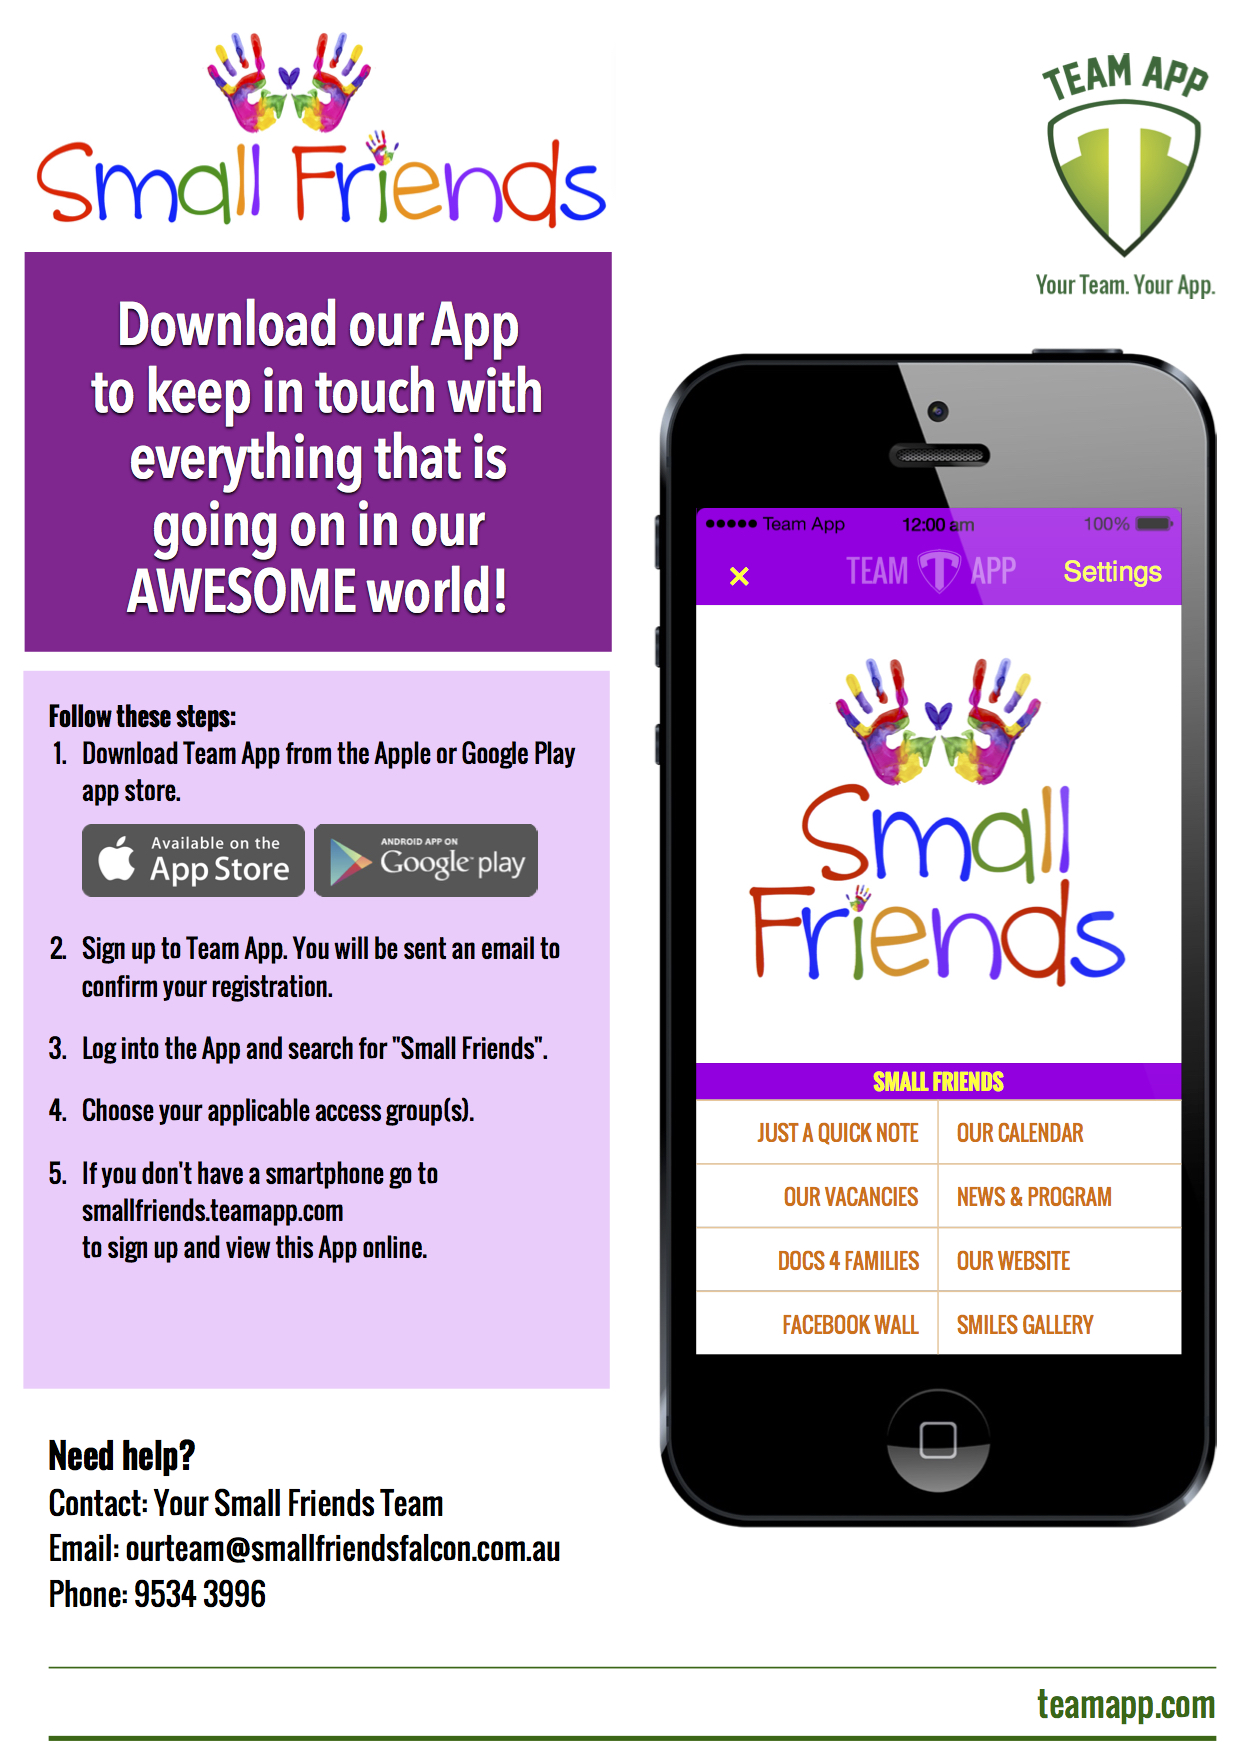 Small Friends App Info.jpg